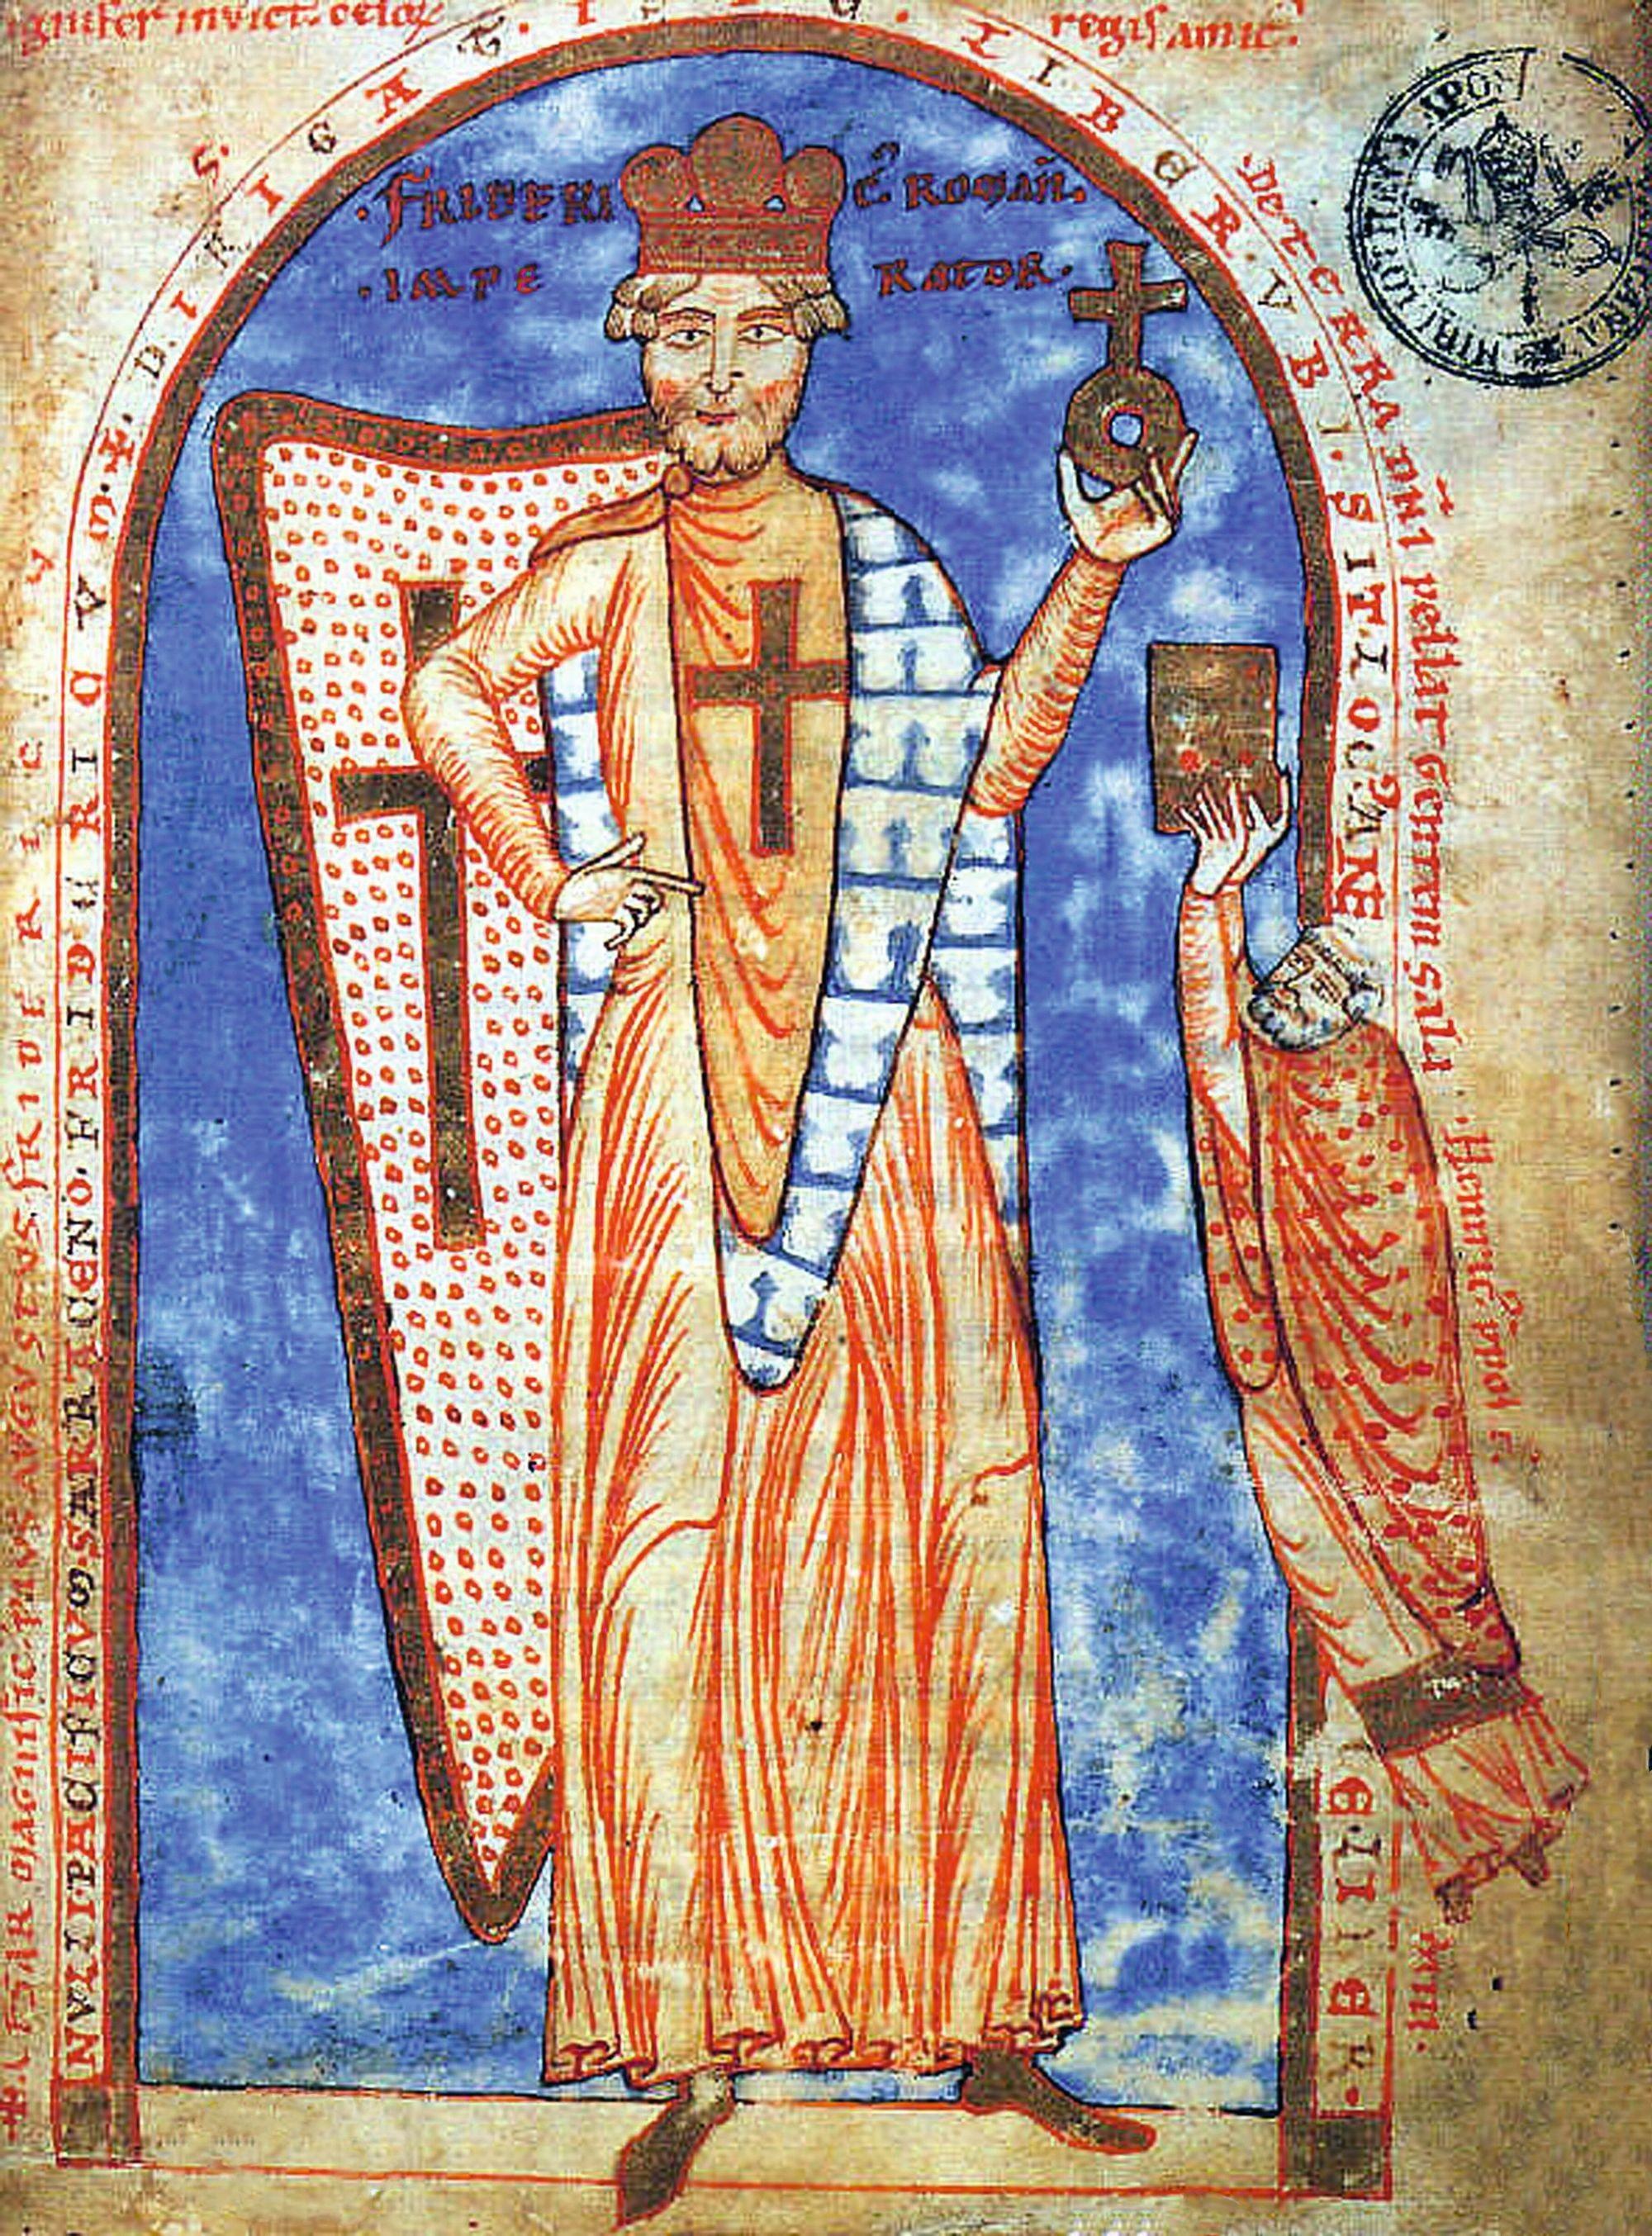 Miniature dans un manuscrit de Robert le Moine, Historia Hierosolymitana, 1188, bibliothèque du Vatican